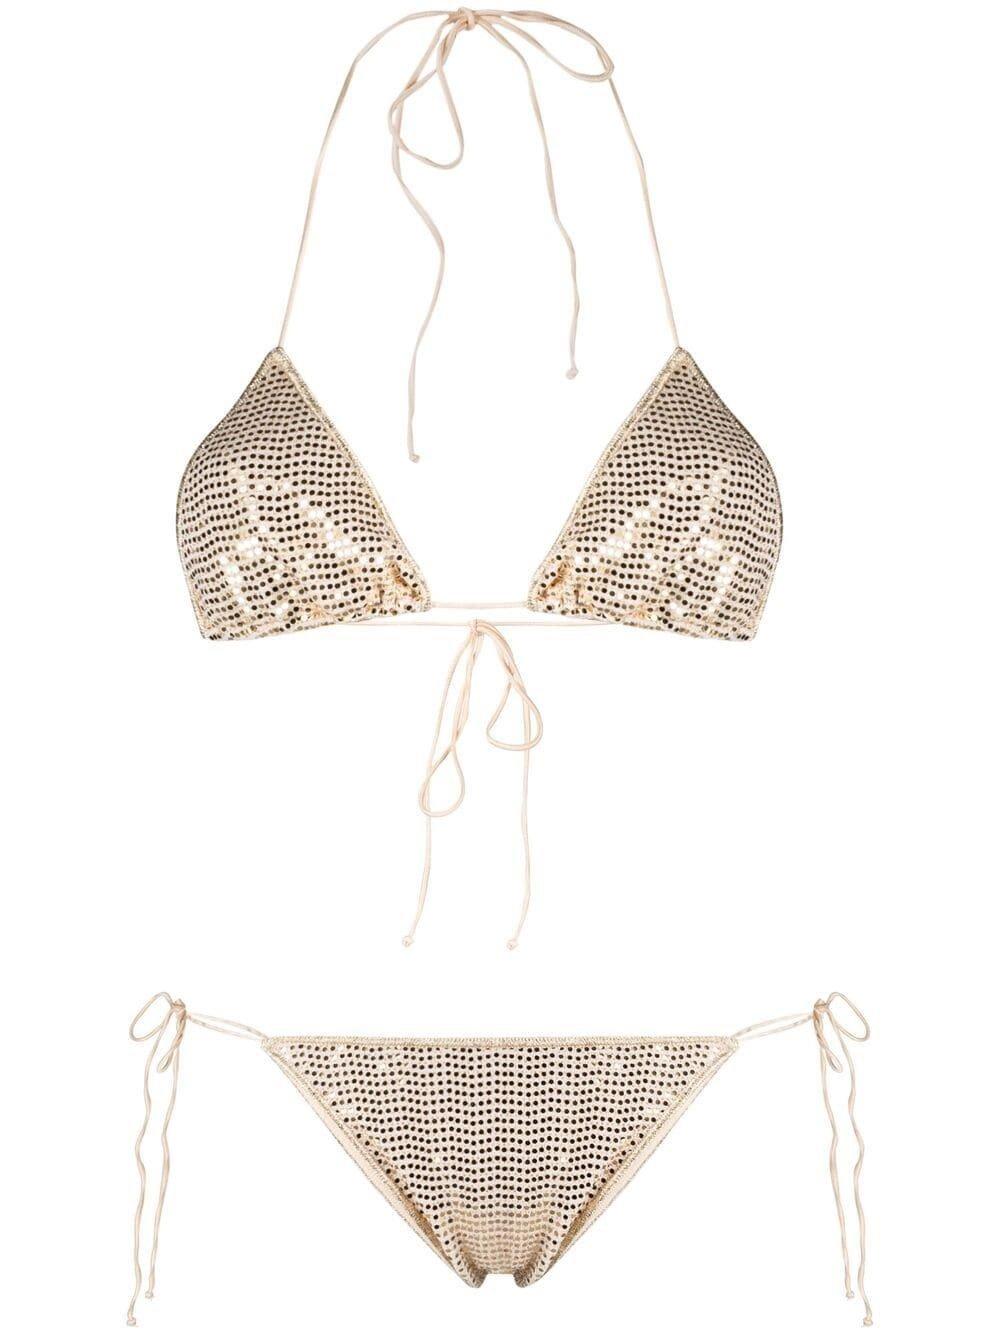 Golden Sequins Bikini